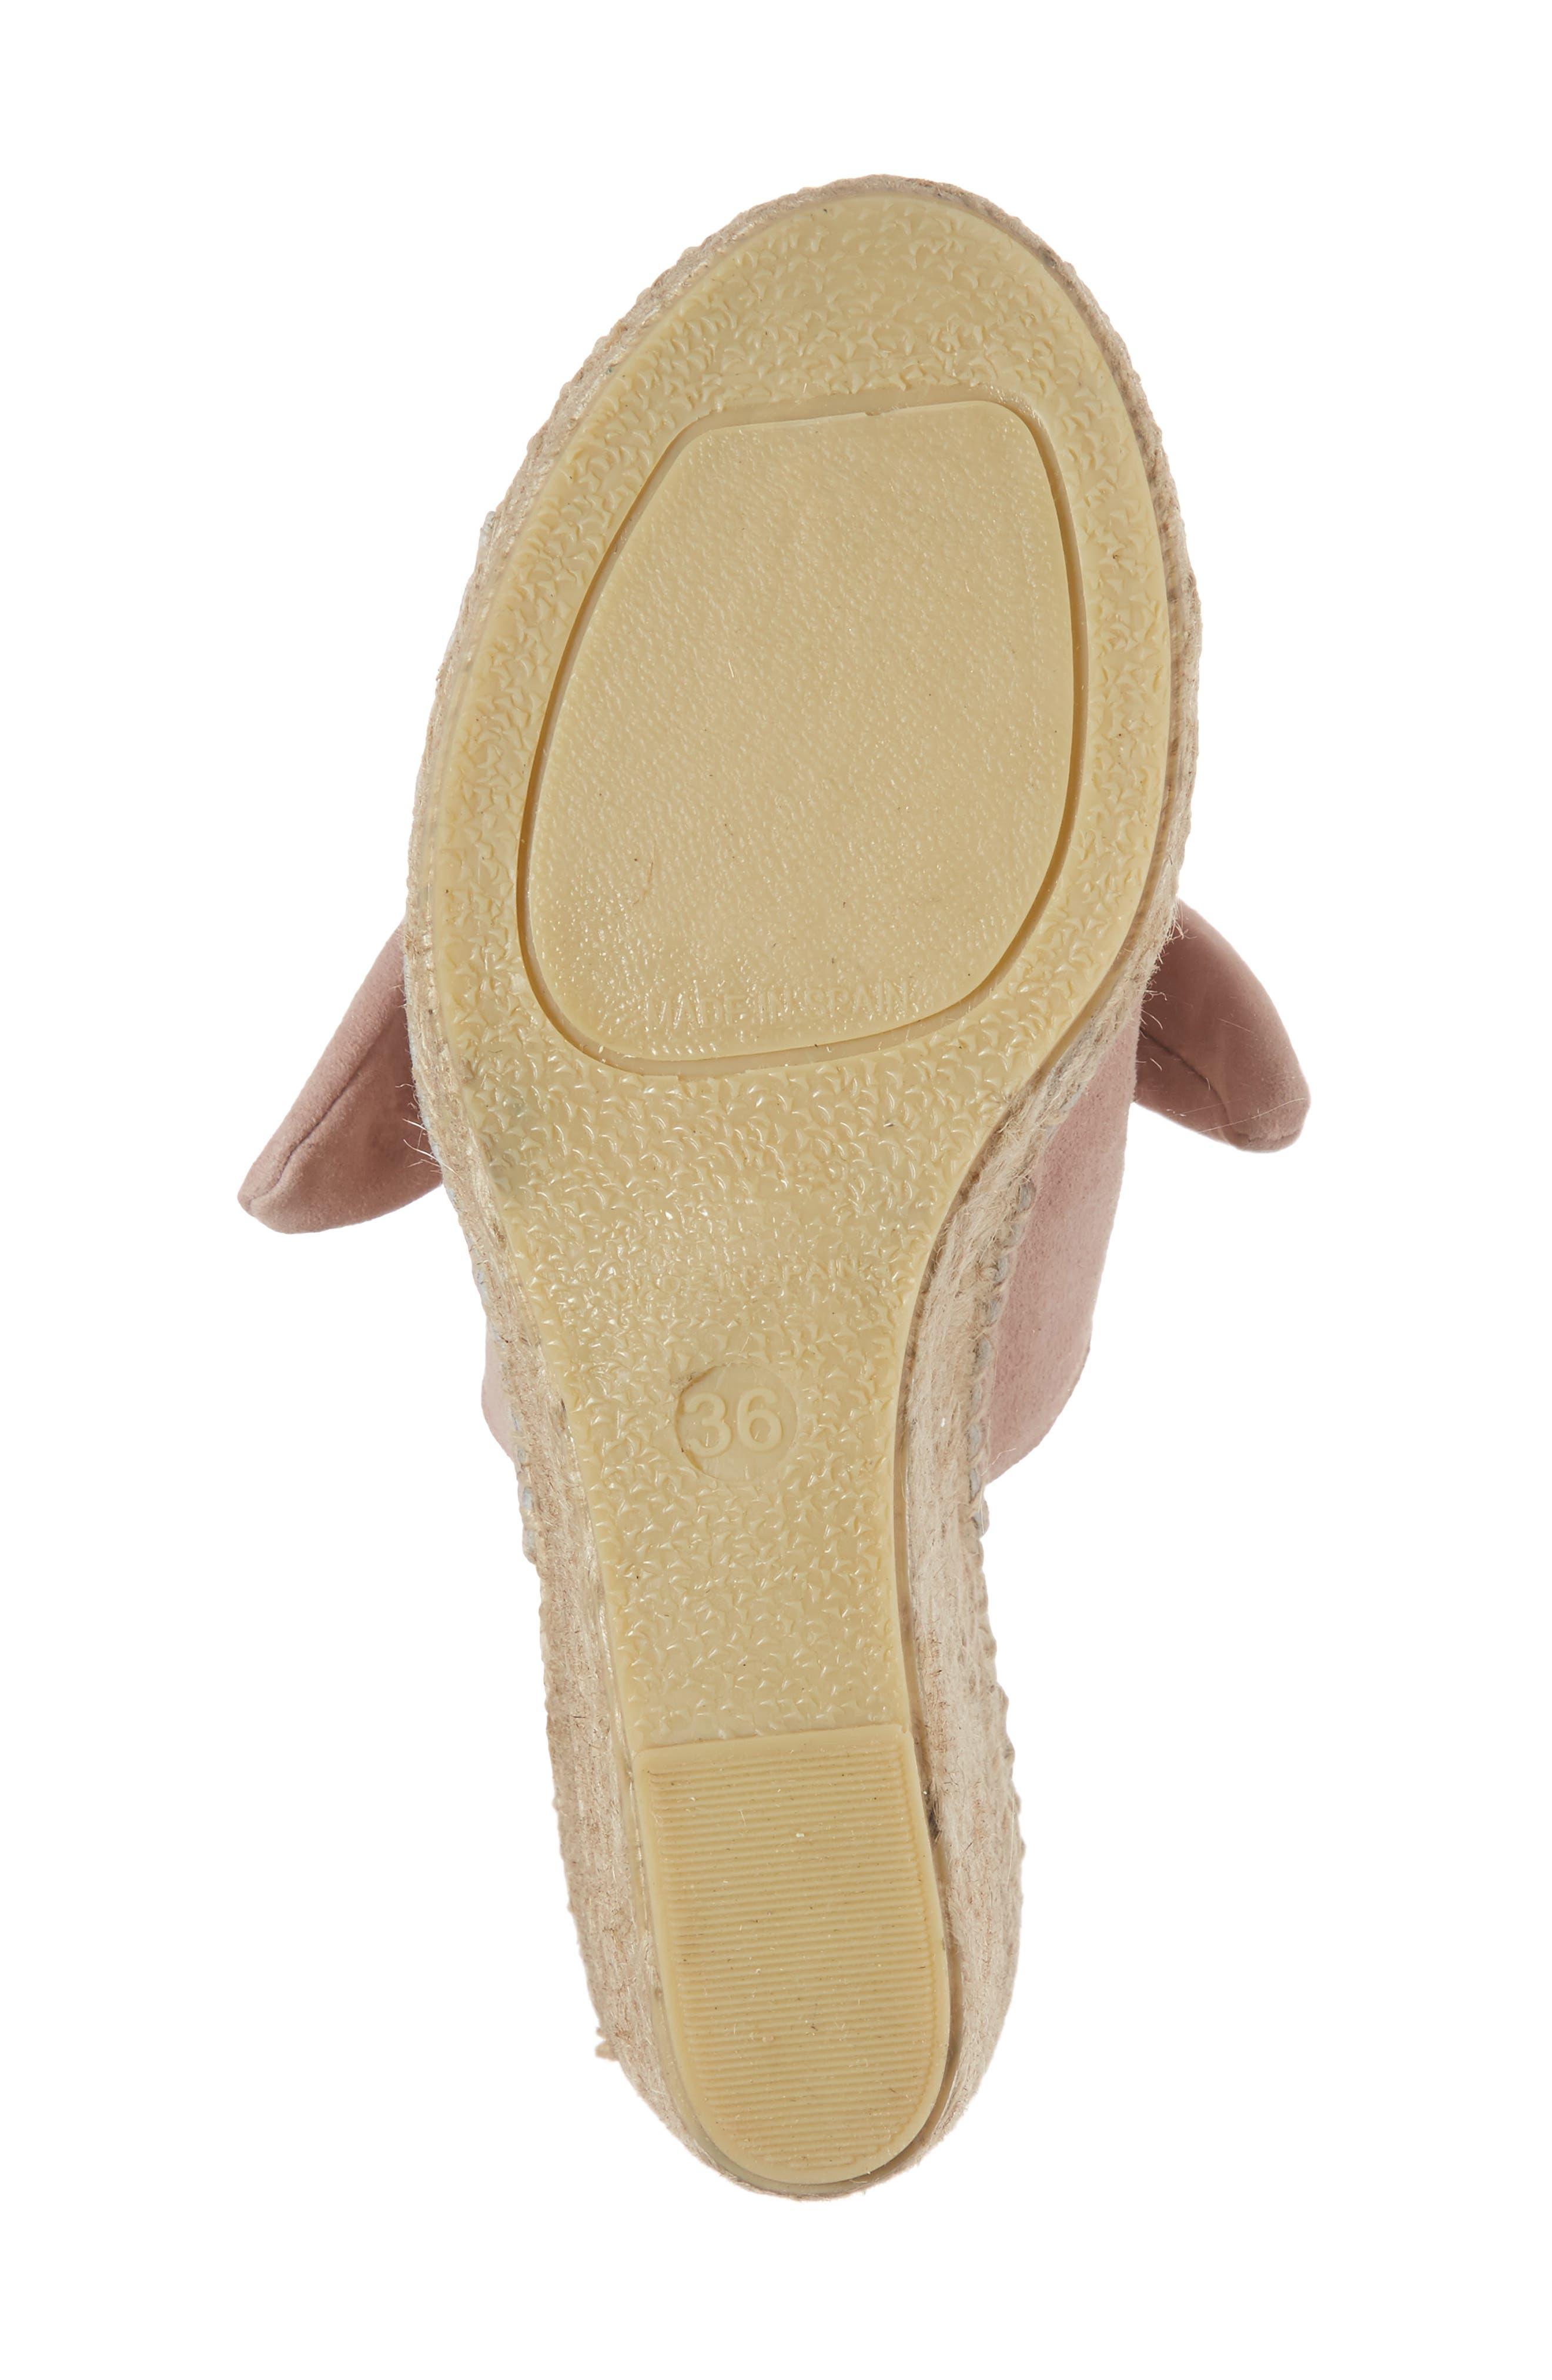 Flirt Espadrille Wedge Sandal,                             Alternate thumbnail 6, color,                             Pink Suede